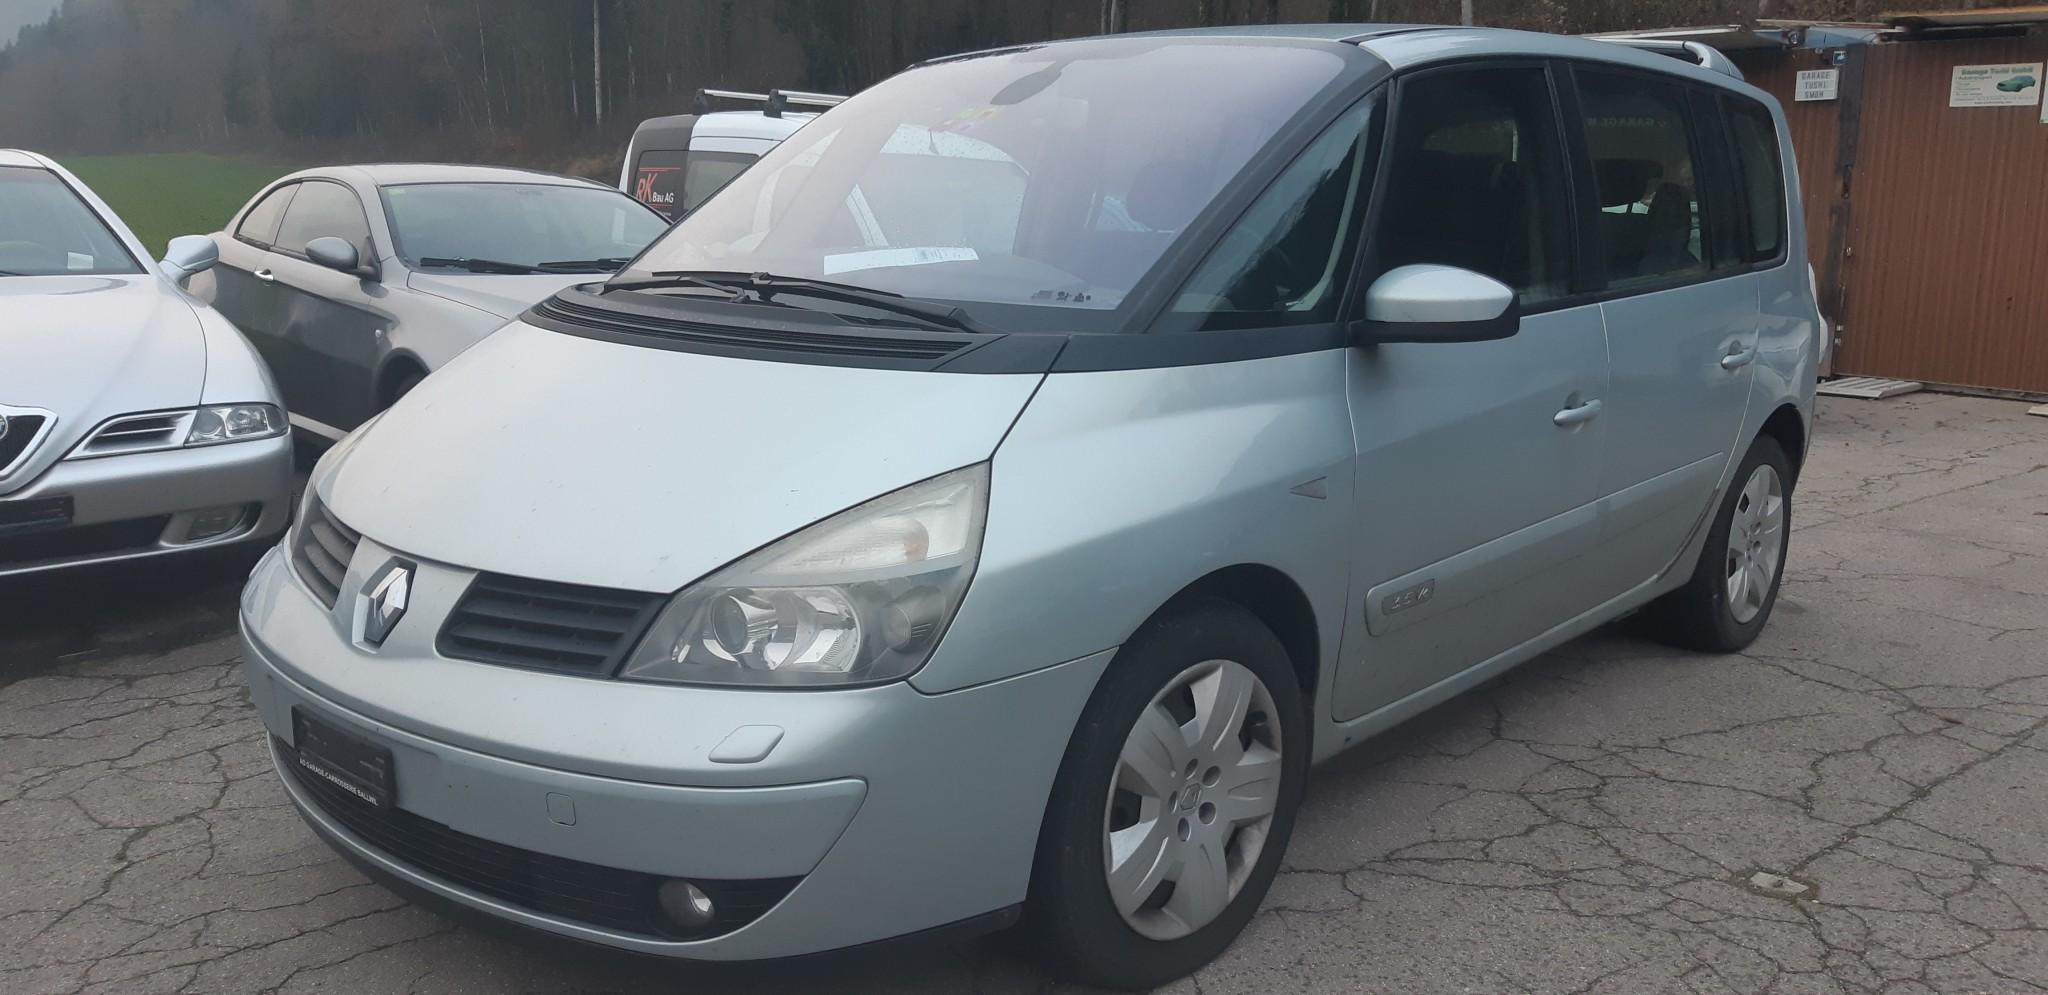 bus Renault Espace 3.5